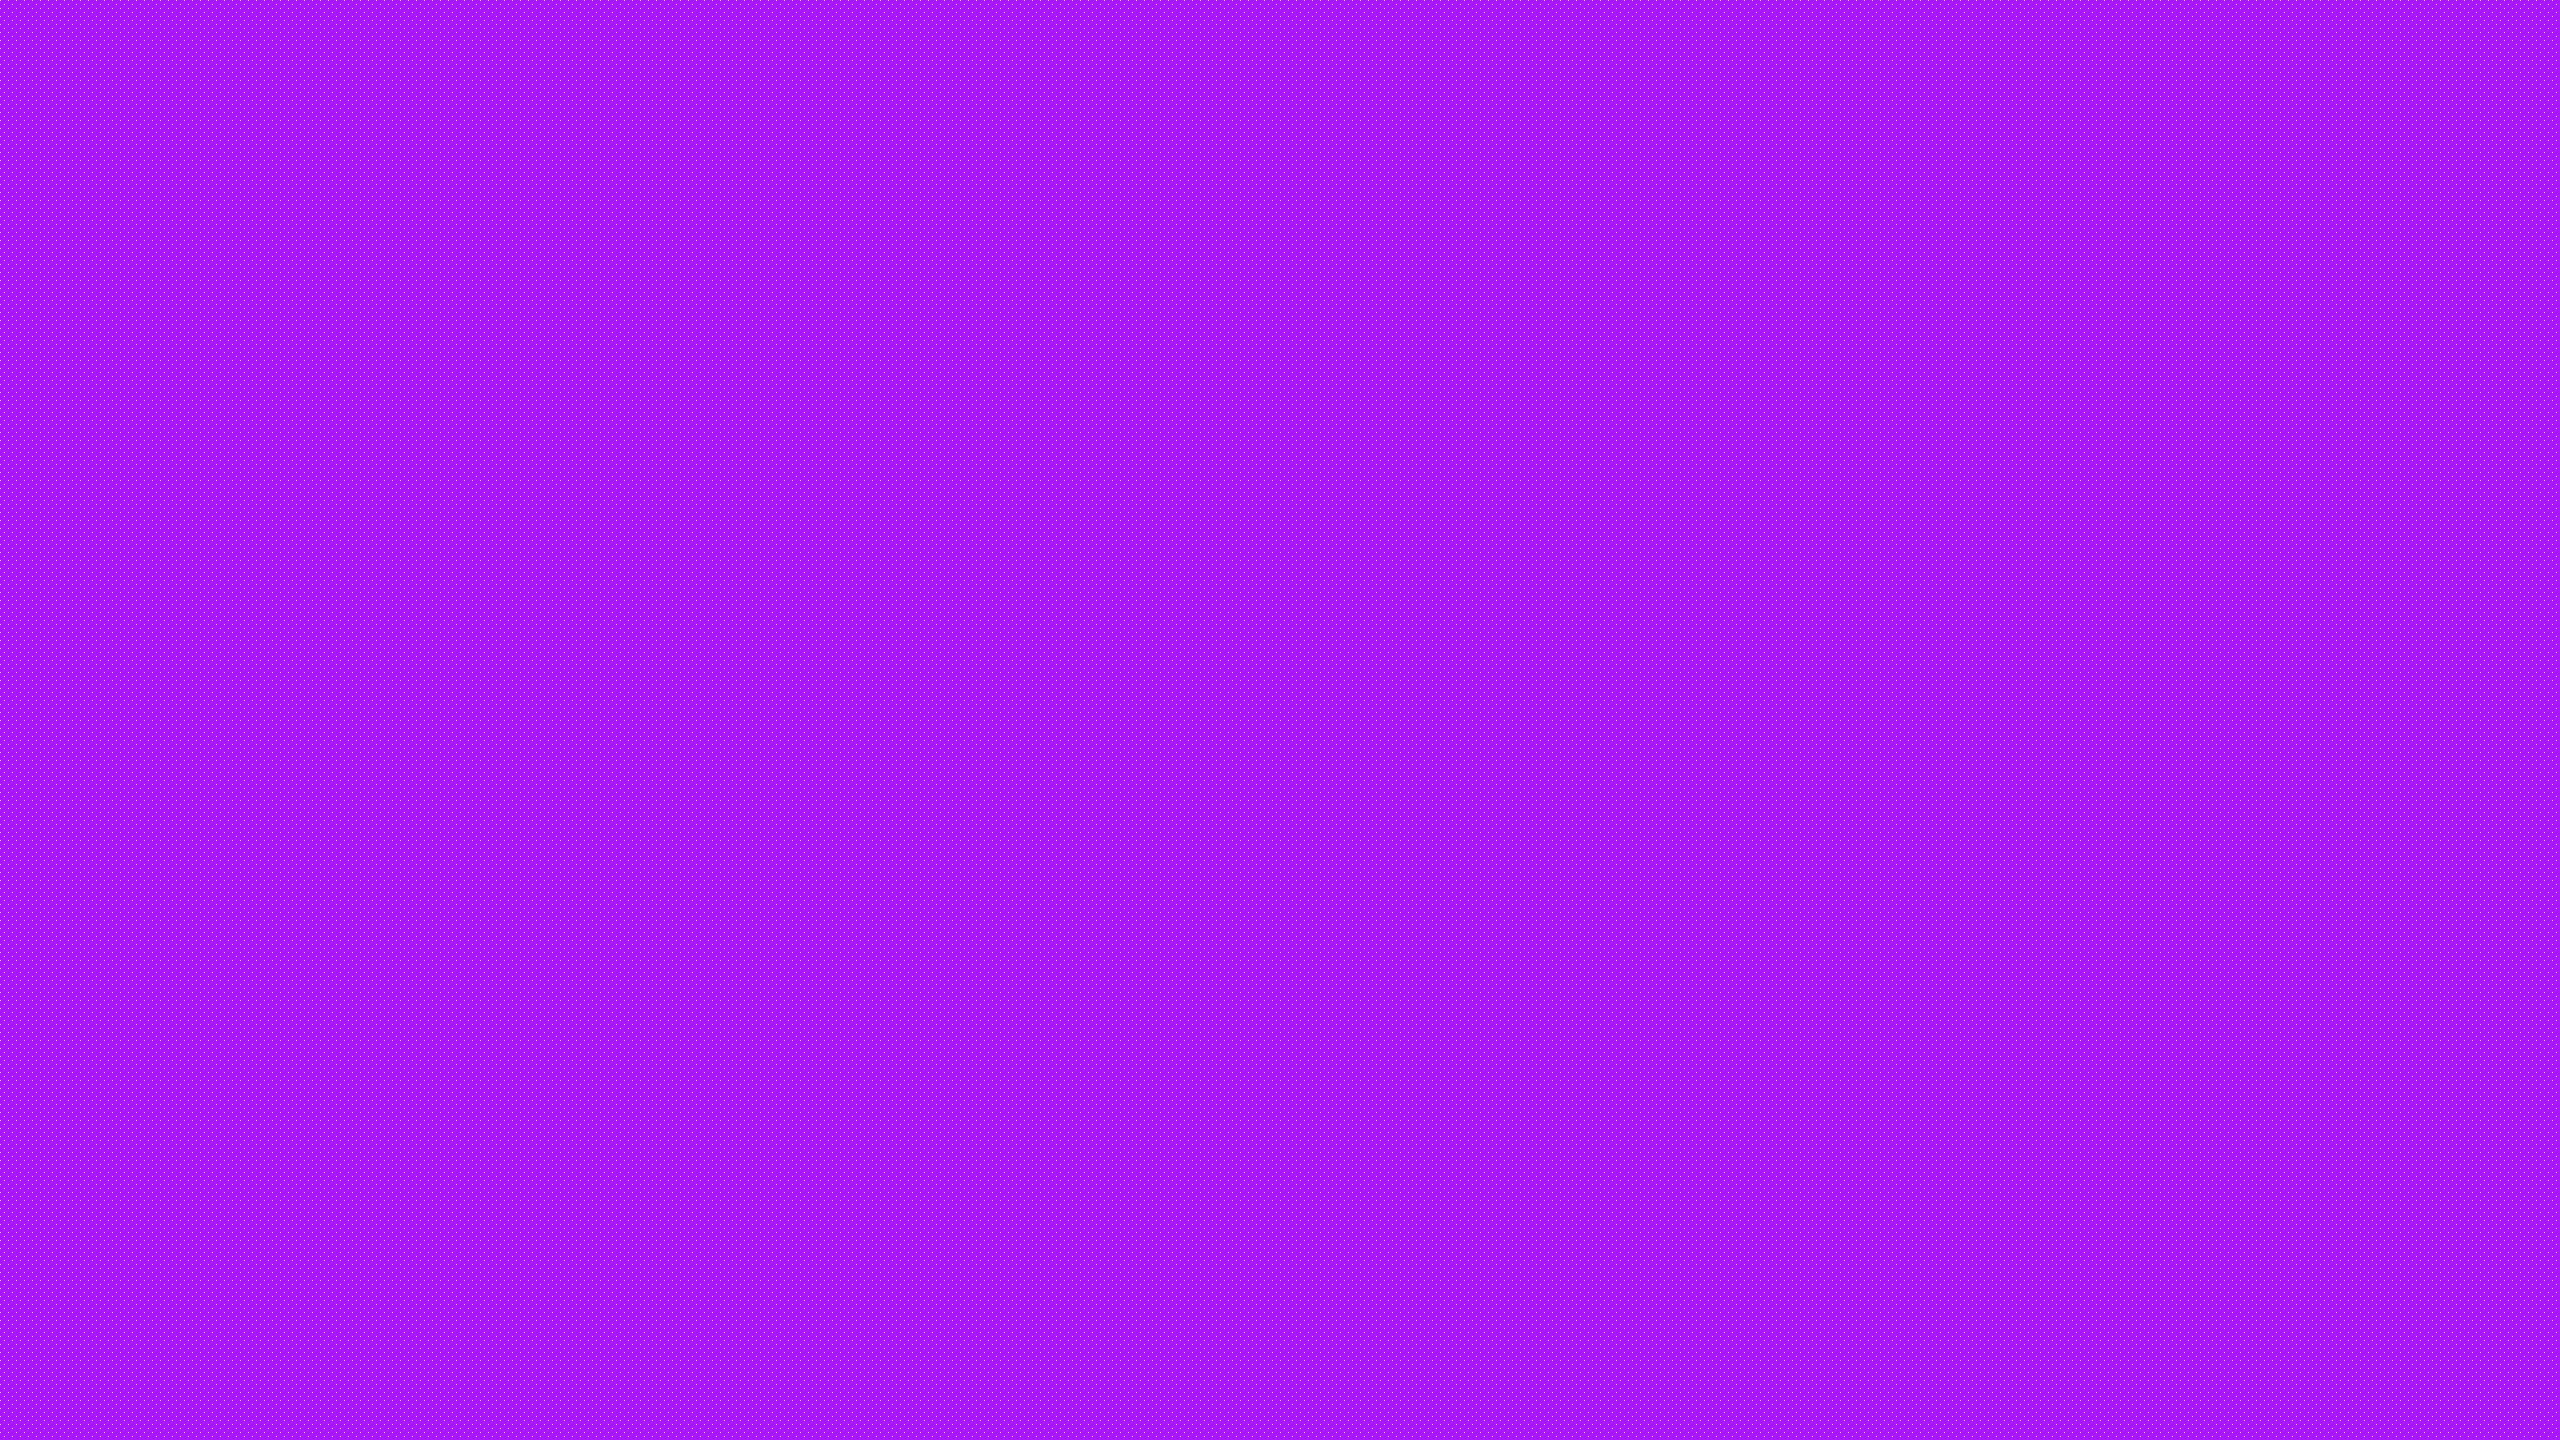 Purple wallpaper desktop wallpapers   1369809 2560x1440